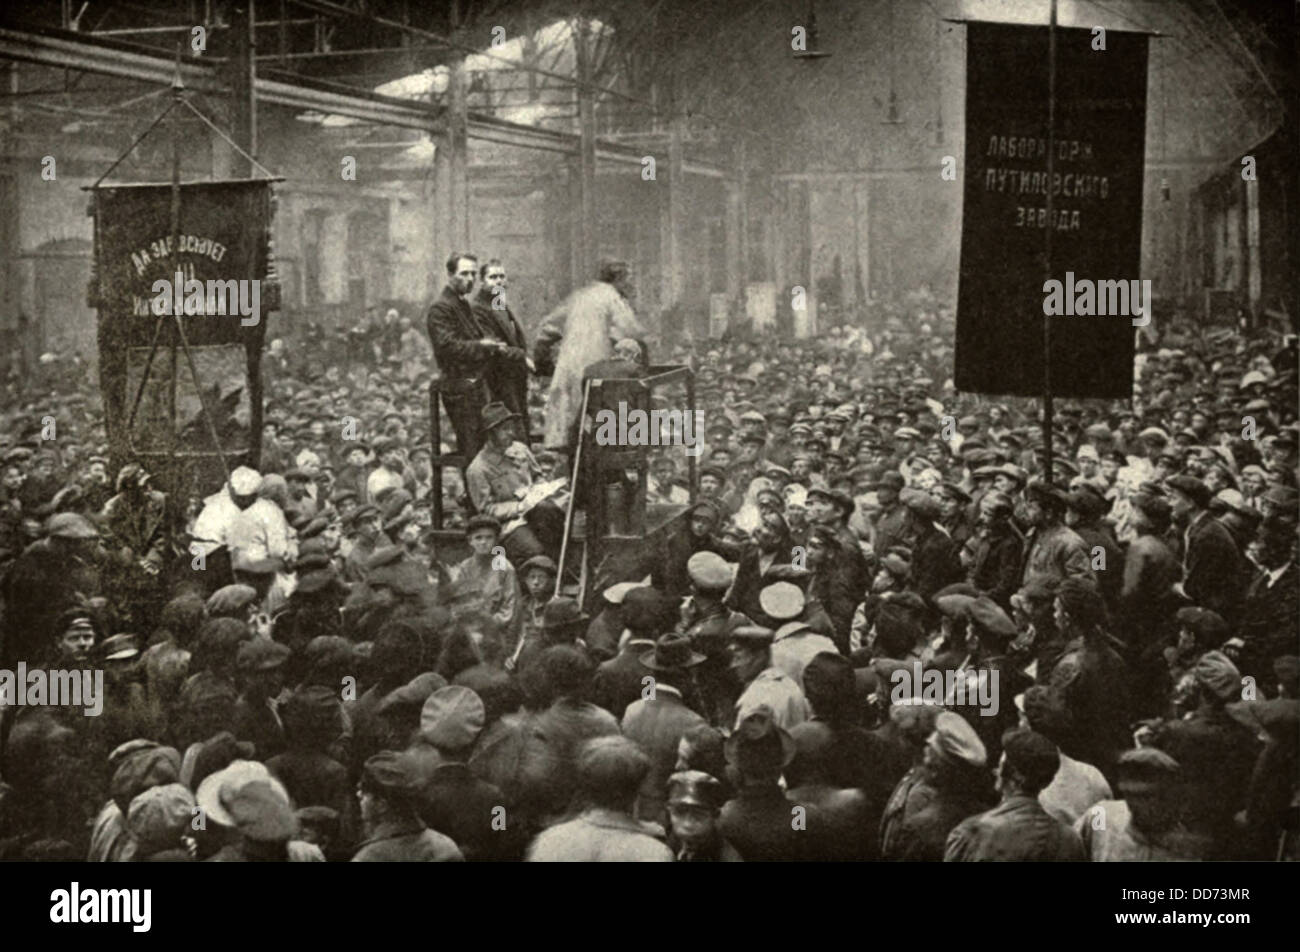 Kirov (Putilov) plant: history, products